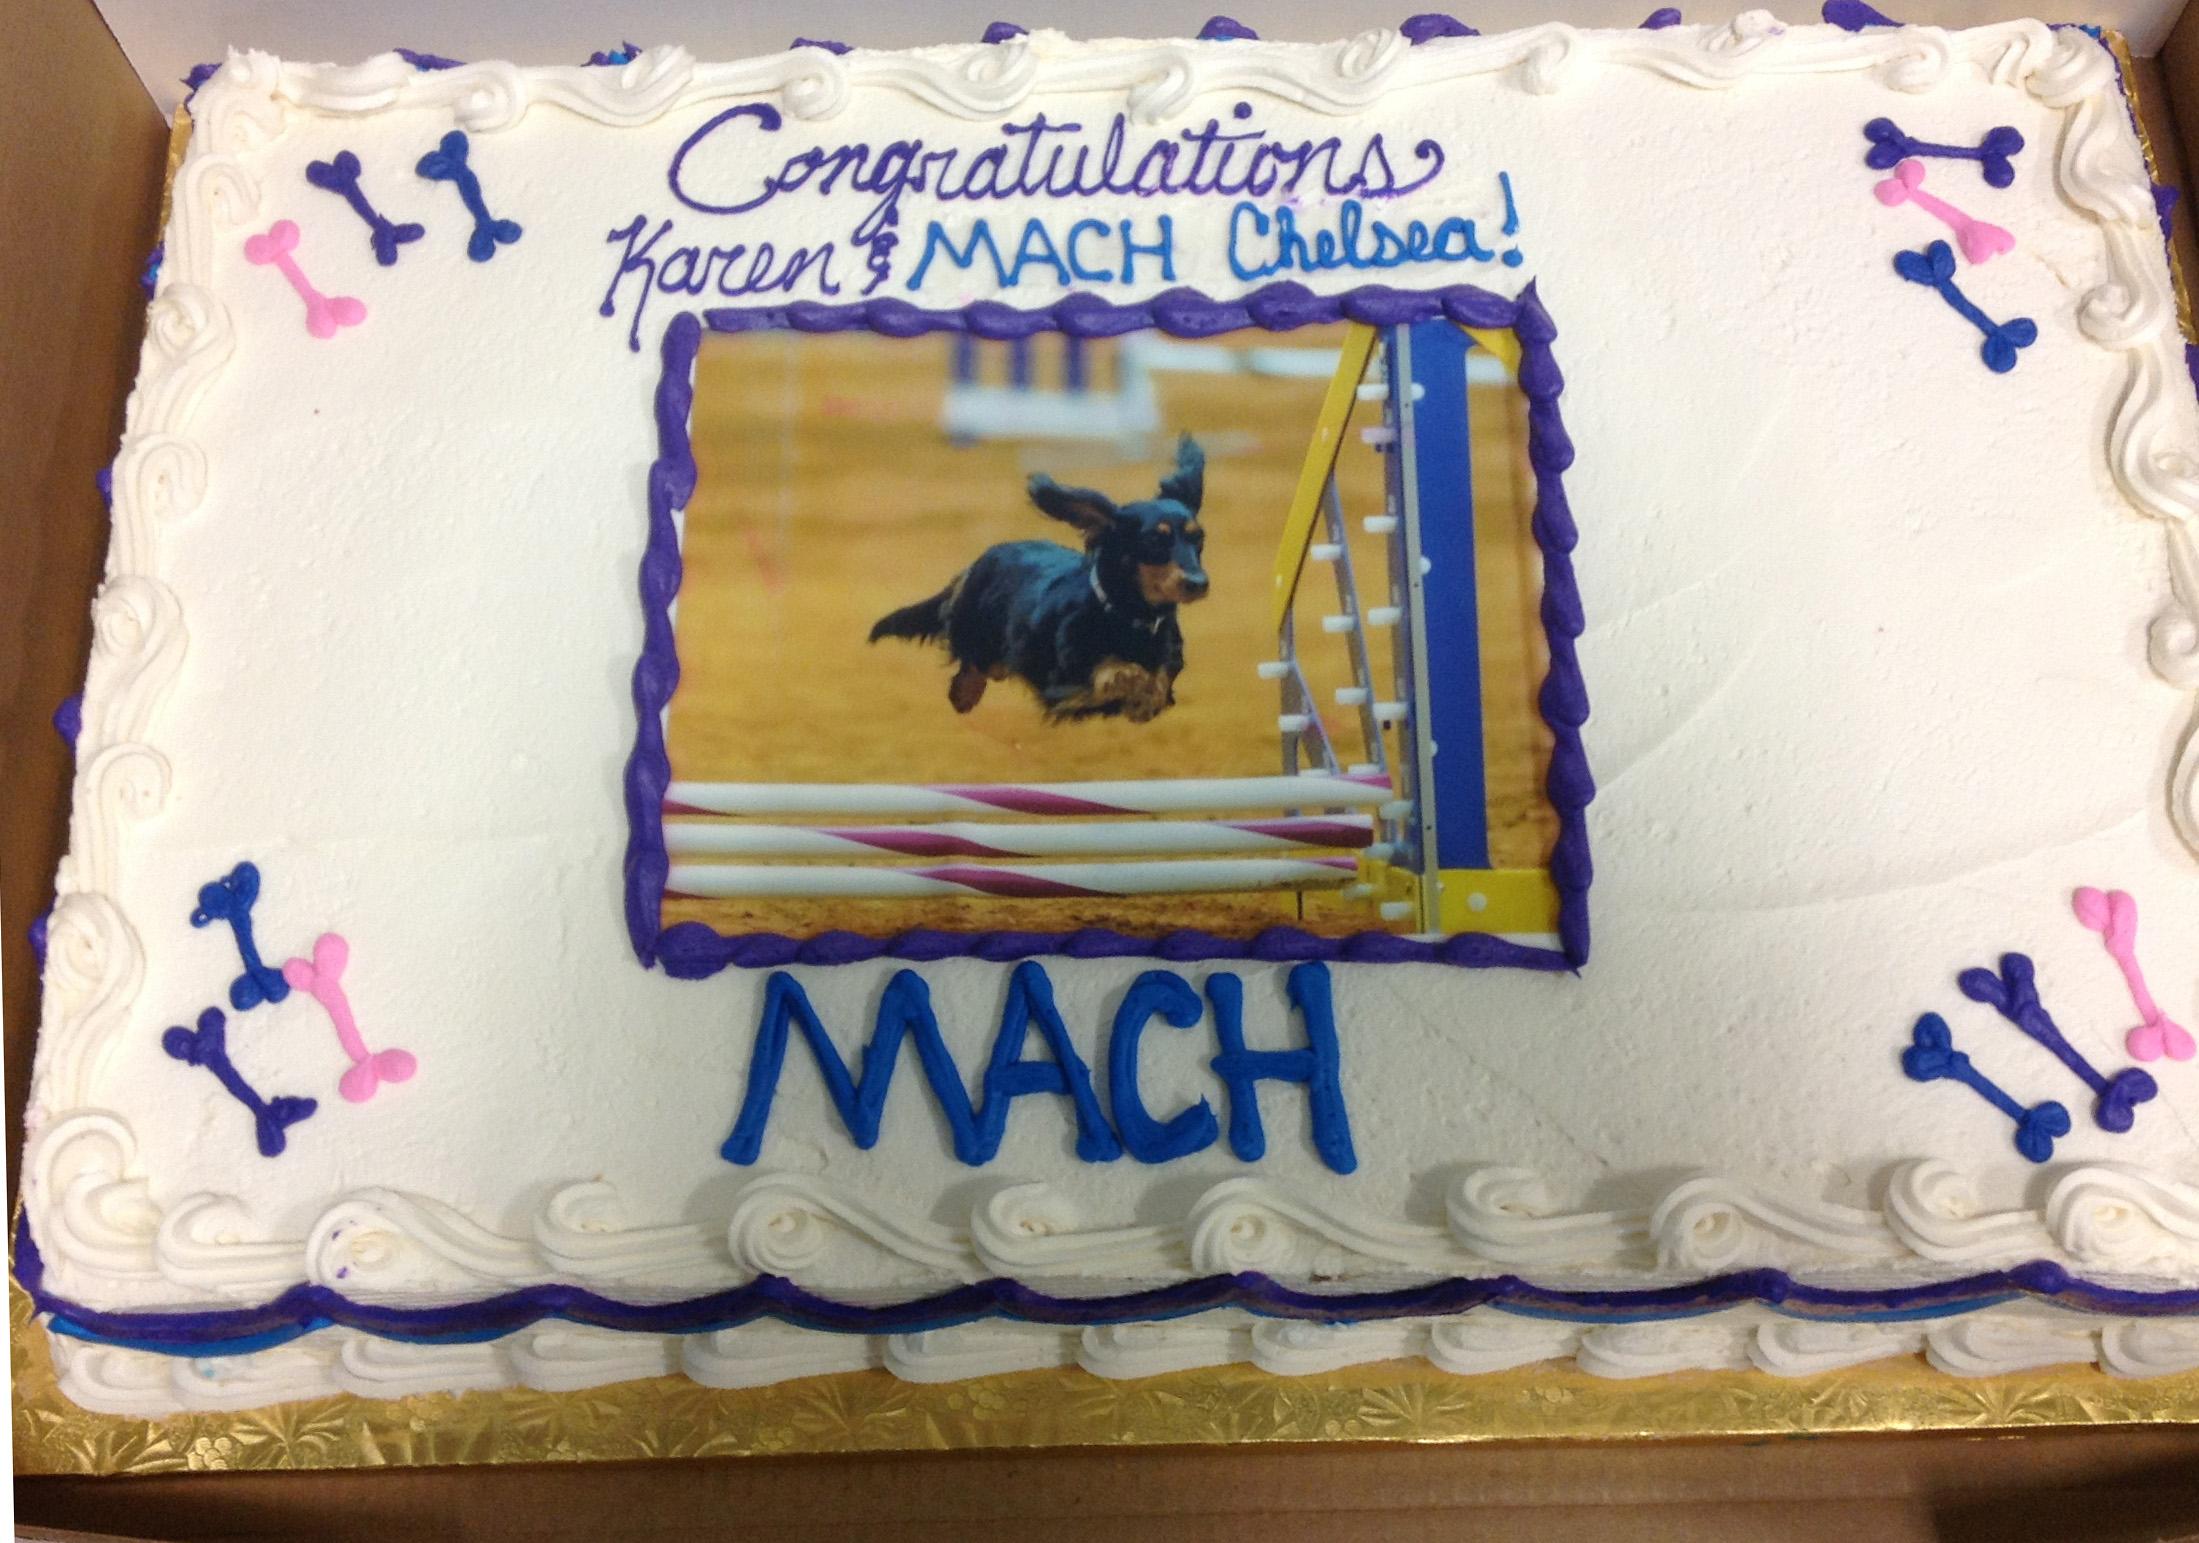 MACH CAKE